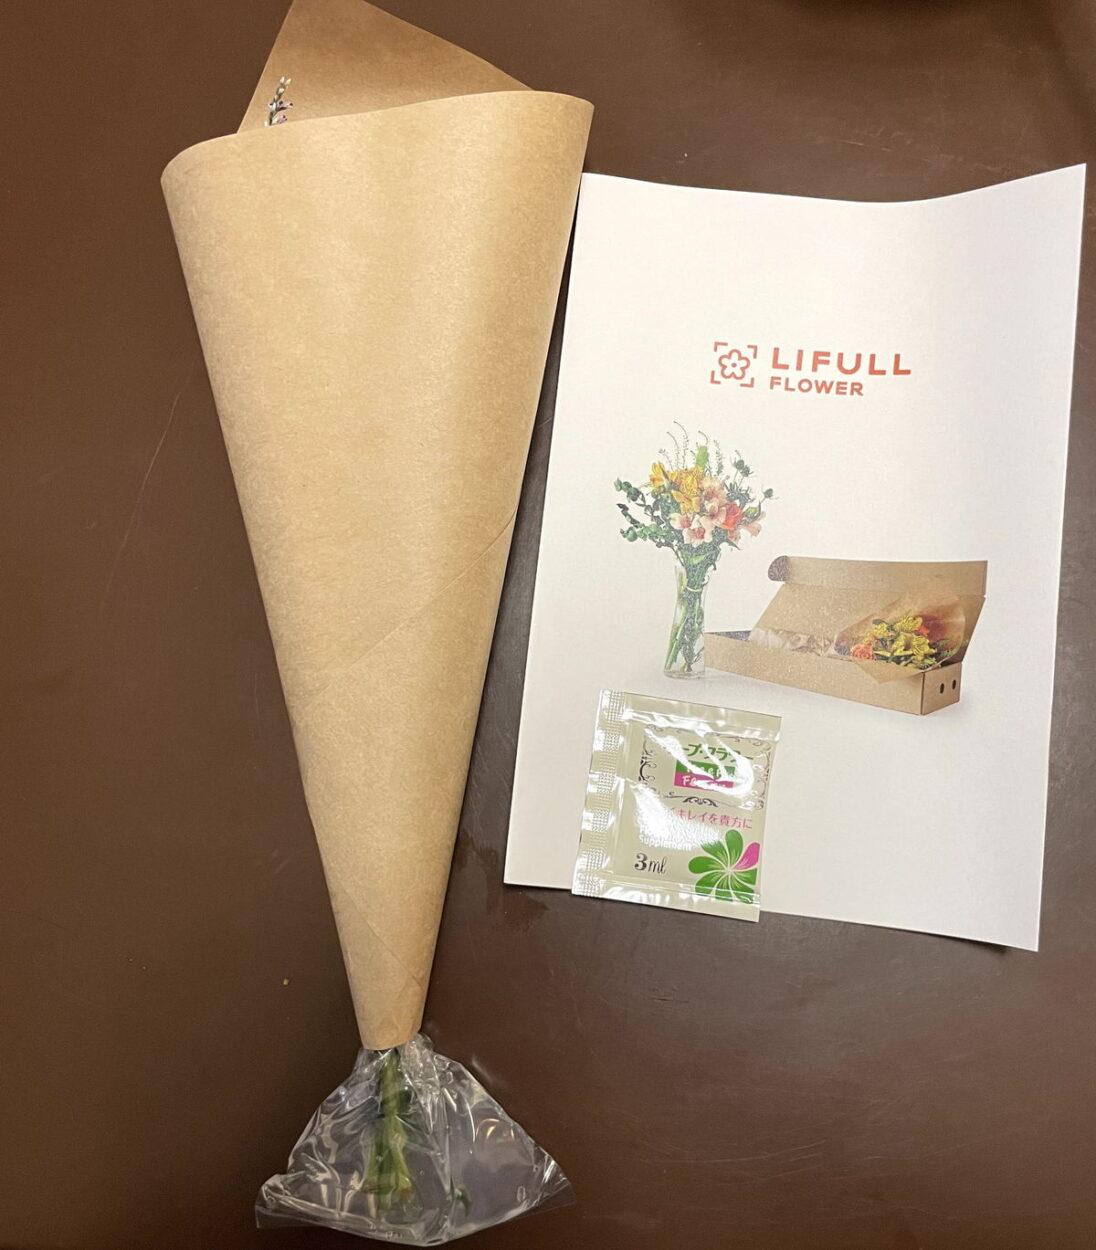 LIFULL FLOWERで届くお花と栄養剤